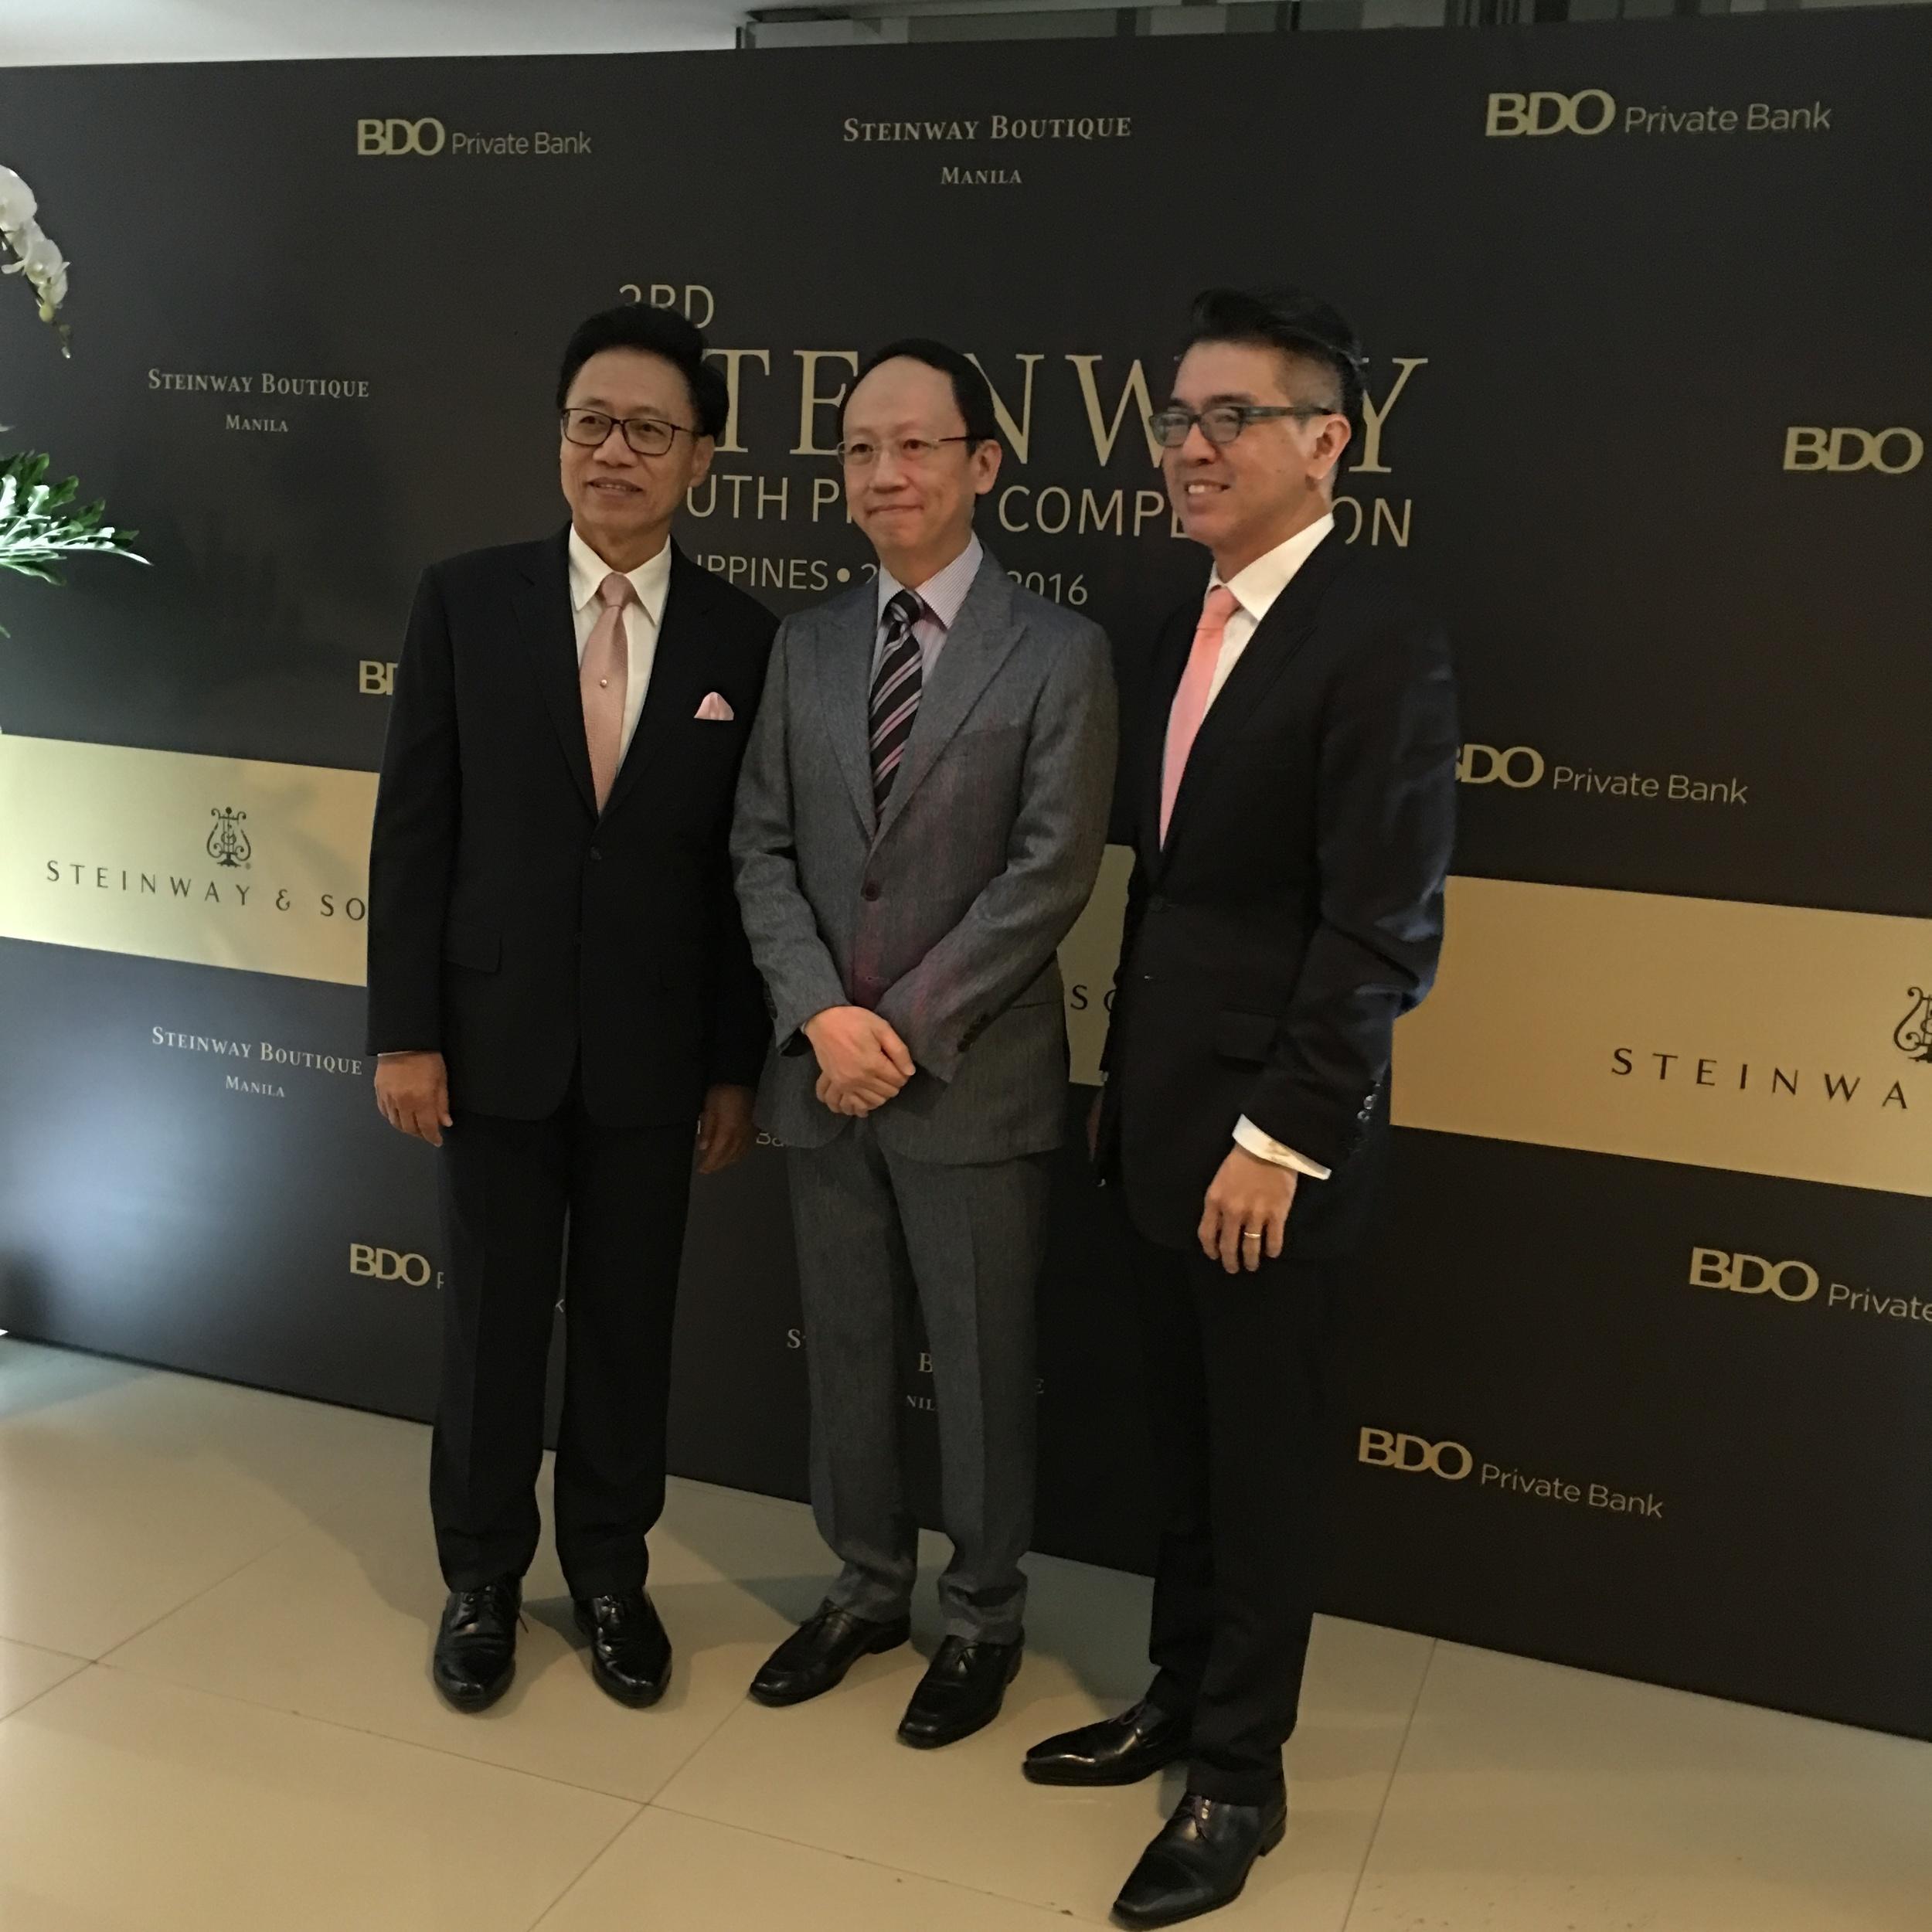 Competition Jury (from left to right): Nat Yontararak, Benjamin Loh, Albert Tiu